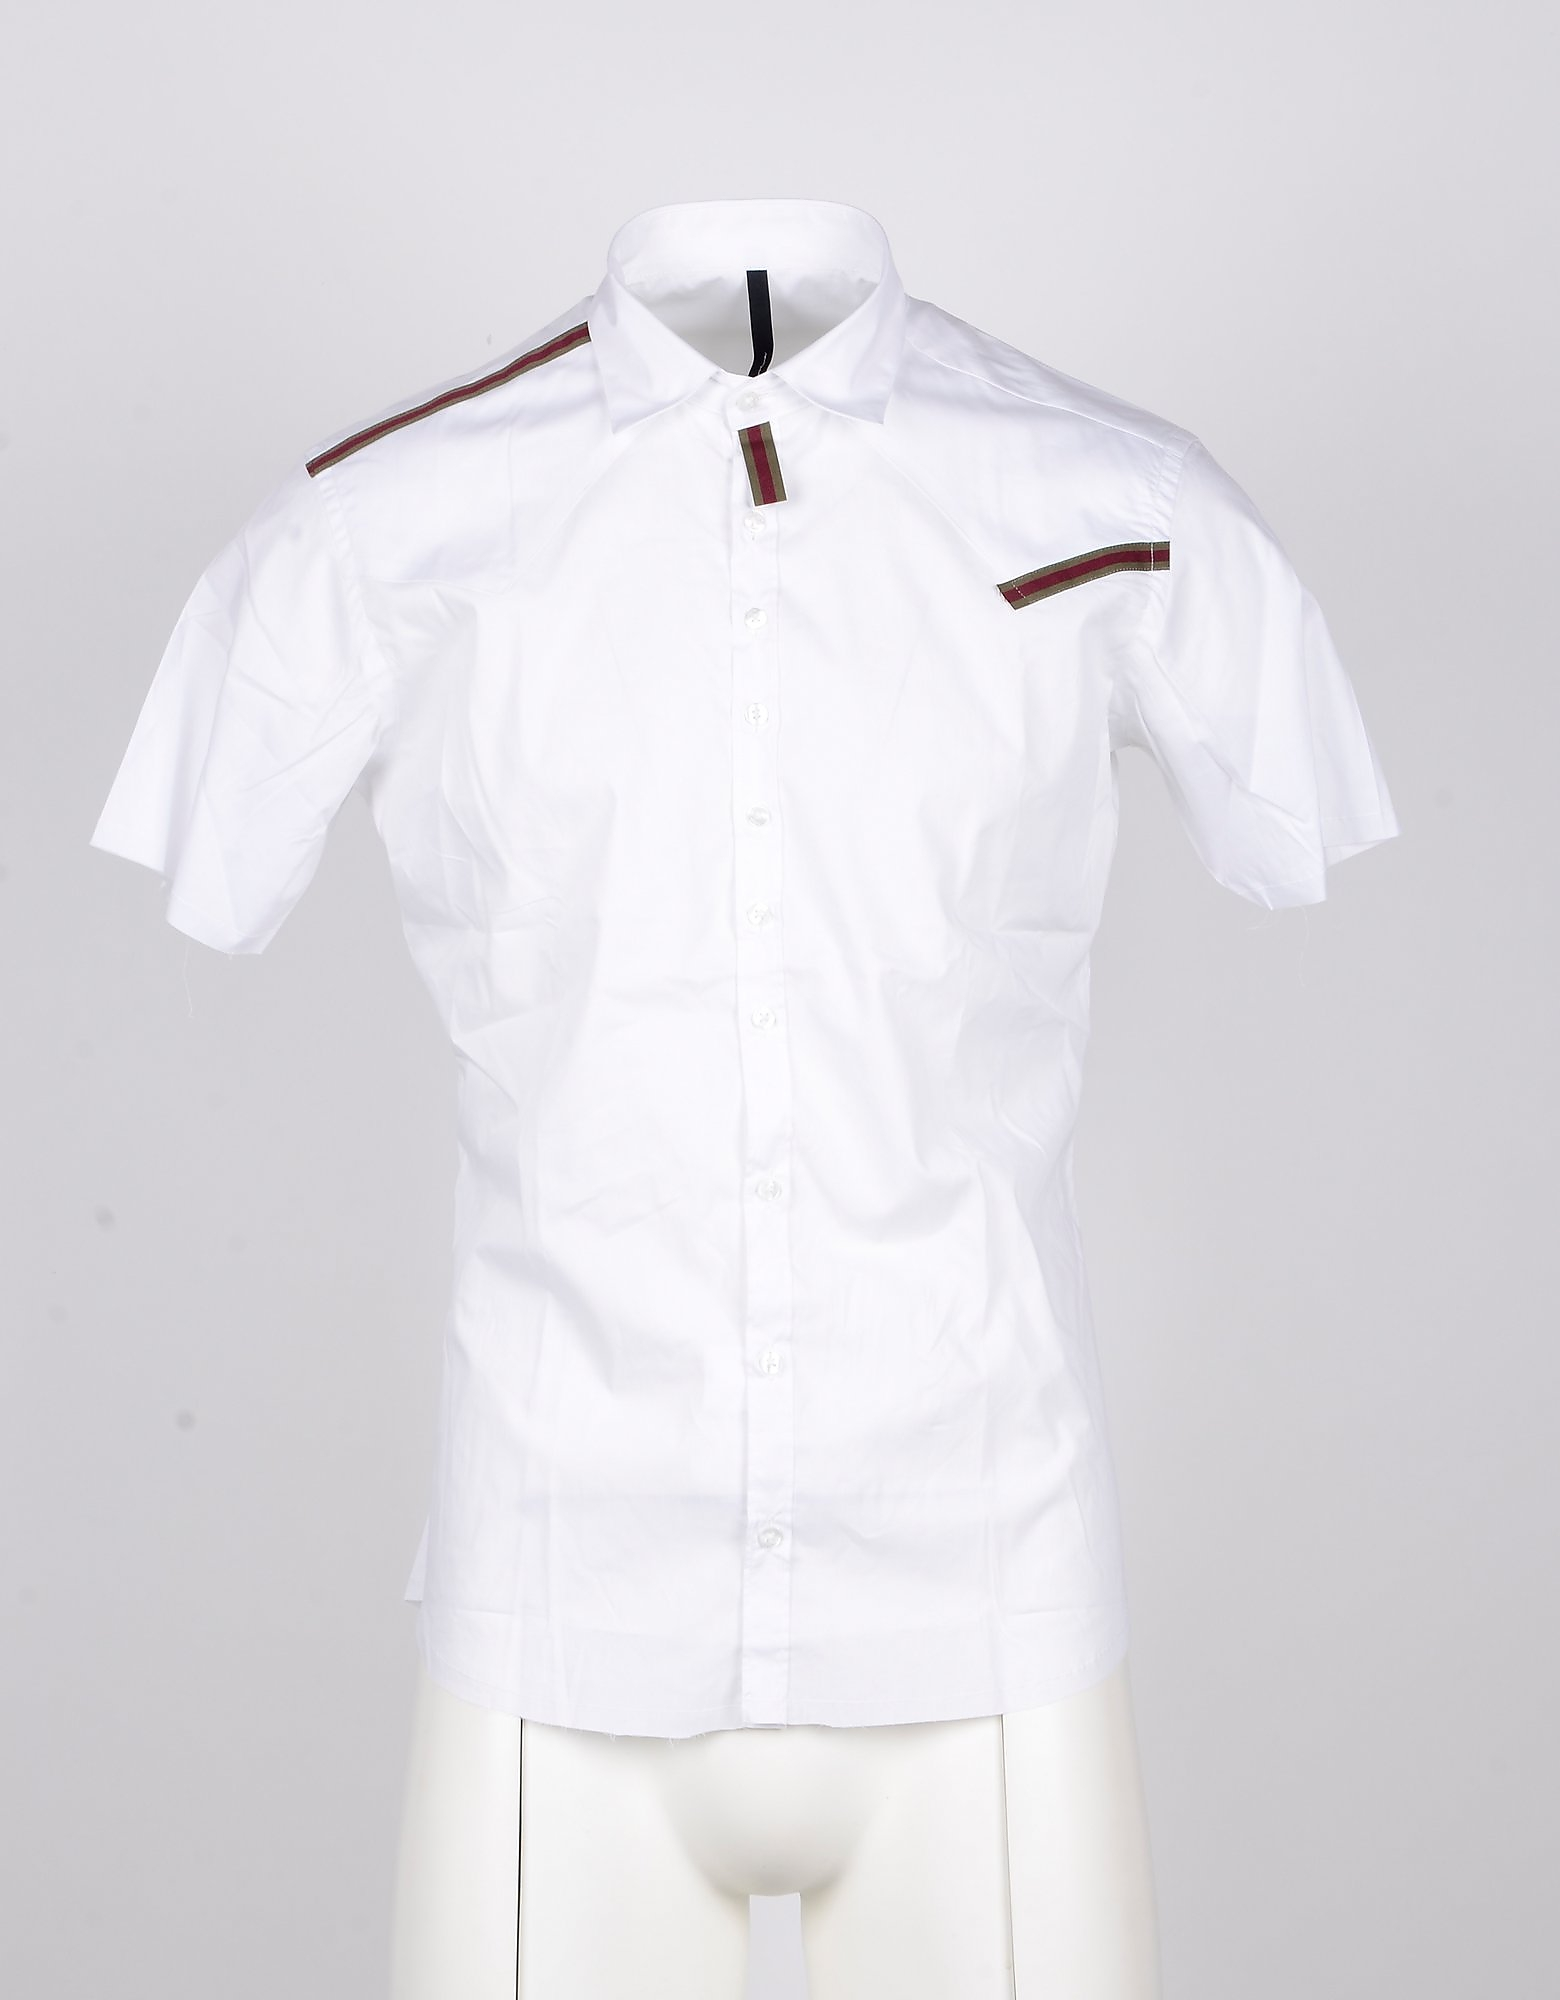 Takeshy Kurosawa Designer Shirts, Short-Sleeved White Men's Shirt